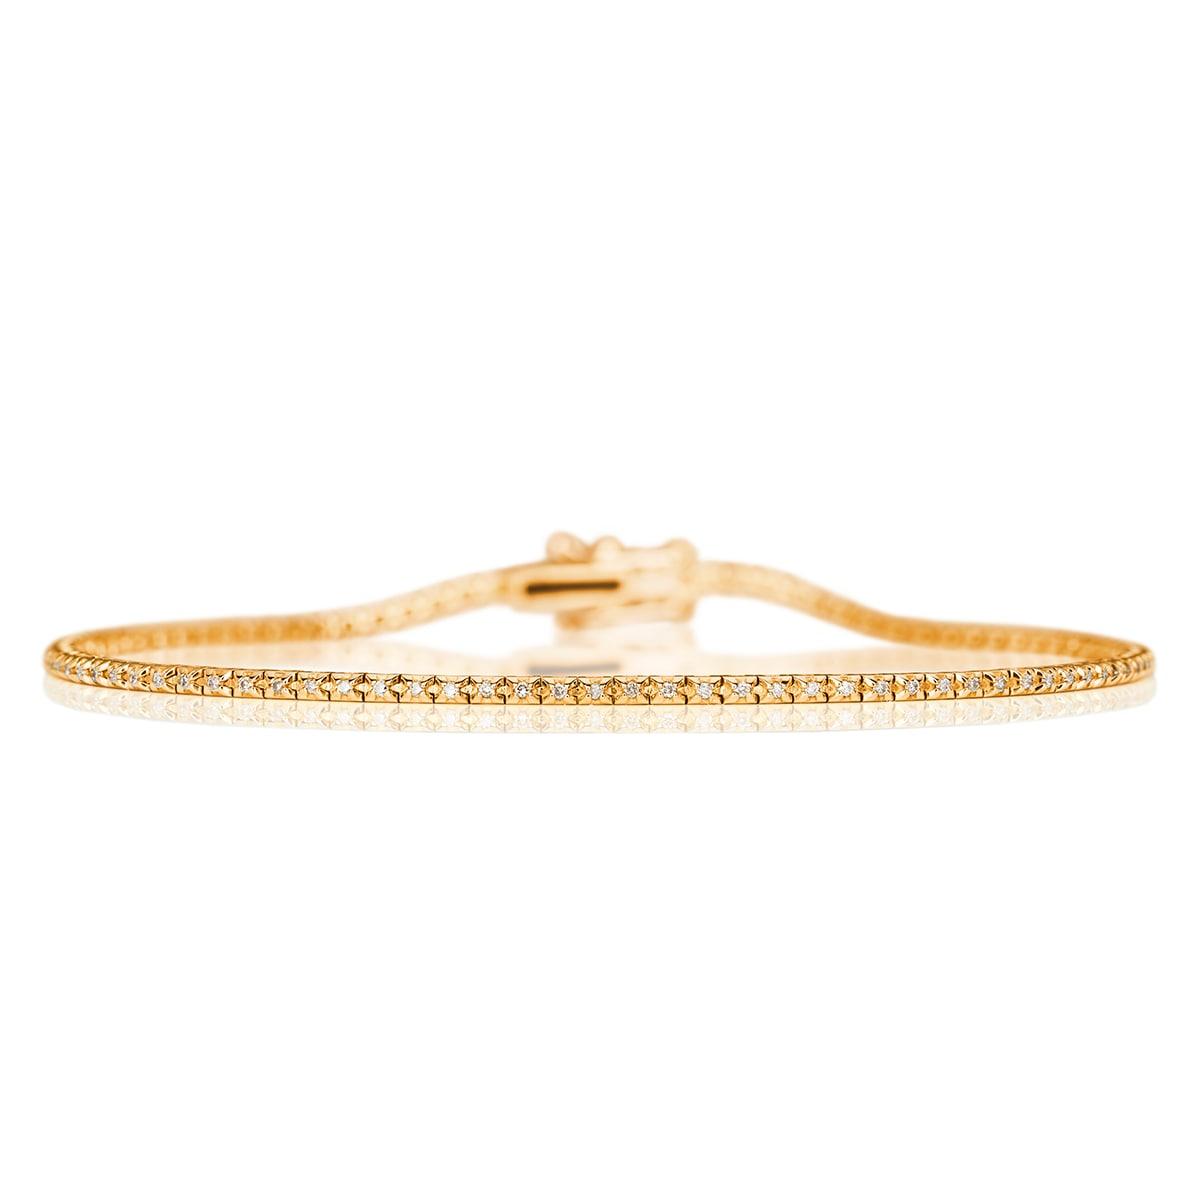 Sandin_Selected_IL_Riviera_RG_190703_0263_diamantarmband_hos_Jarl_Sandin